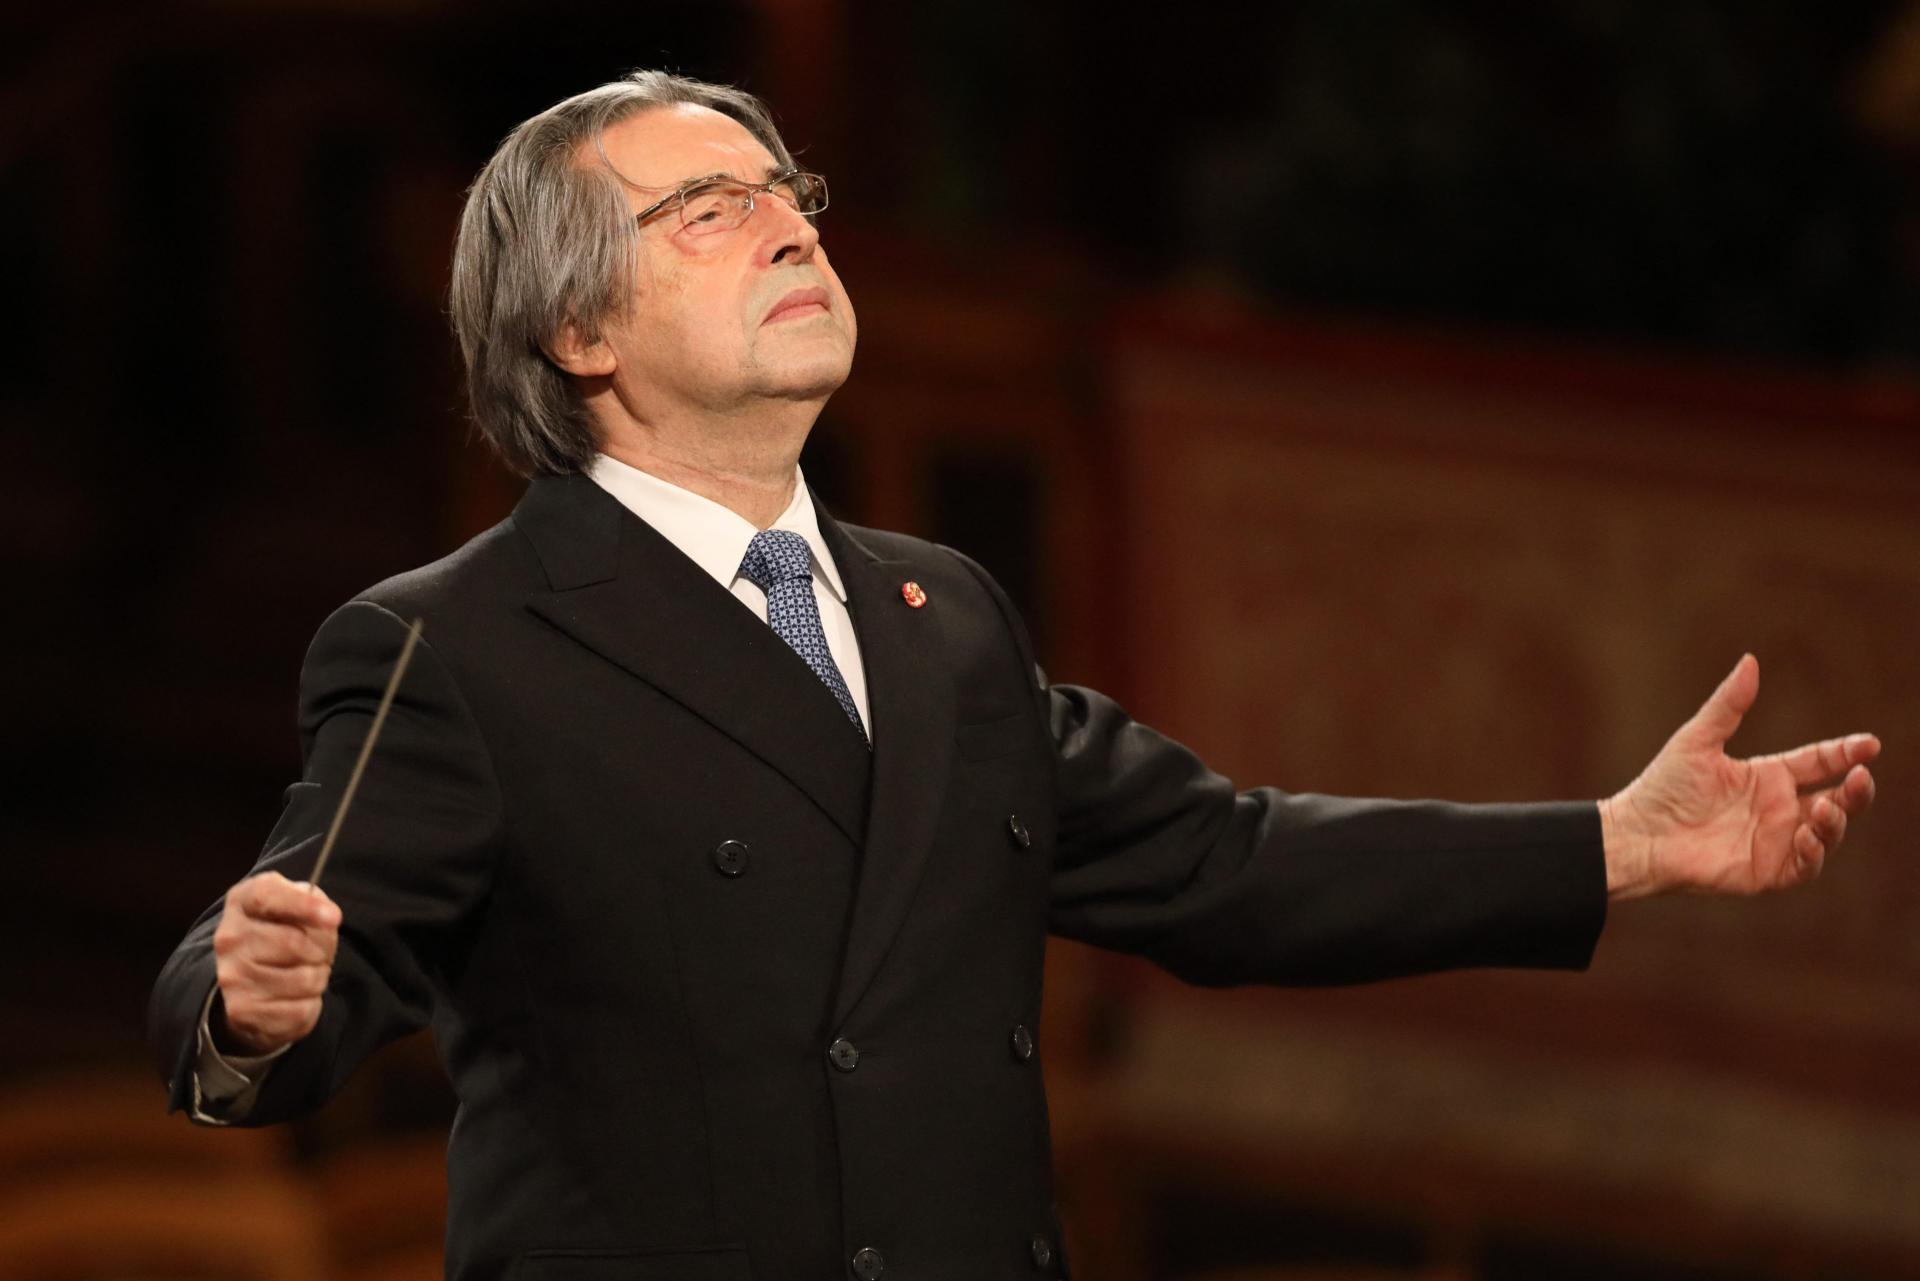 Italian conductor Riccardo Muti returns to La Scala on Tuesday for the 75th anniversary. Photo: Dieter Nagl/APA/Wiener Philharmoniker/AFP